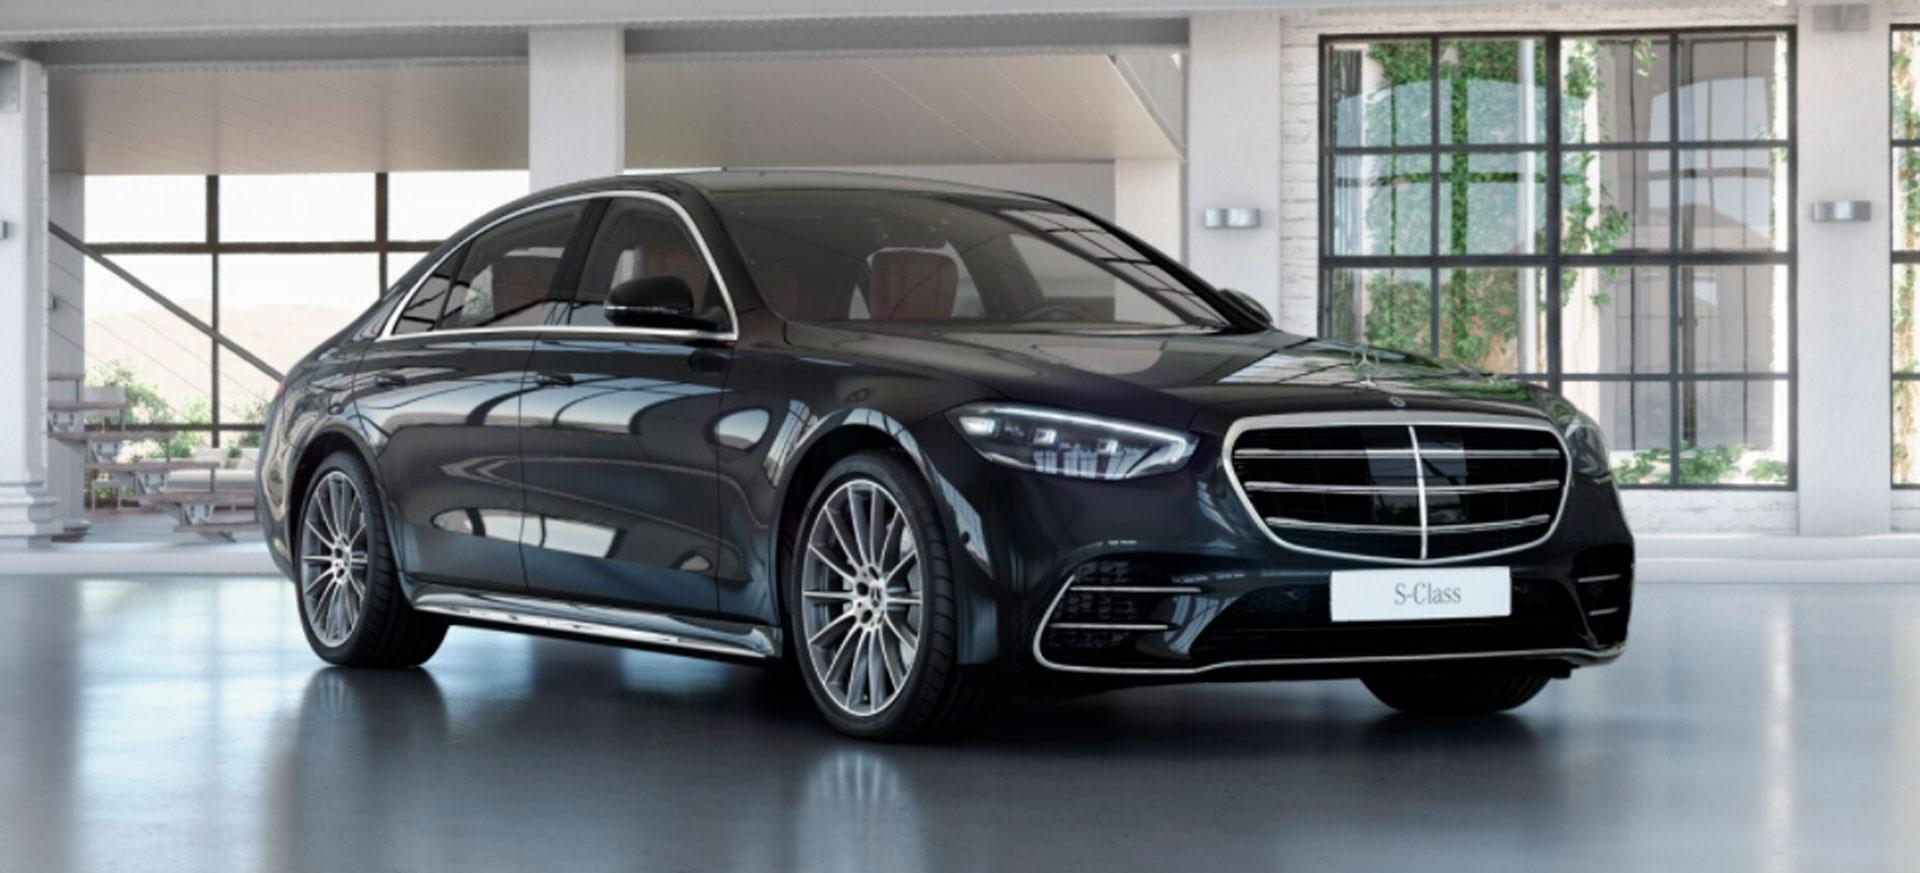 Mercedes-Benz S-Class Limousine 0152632034